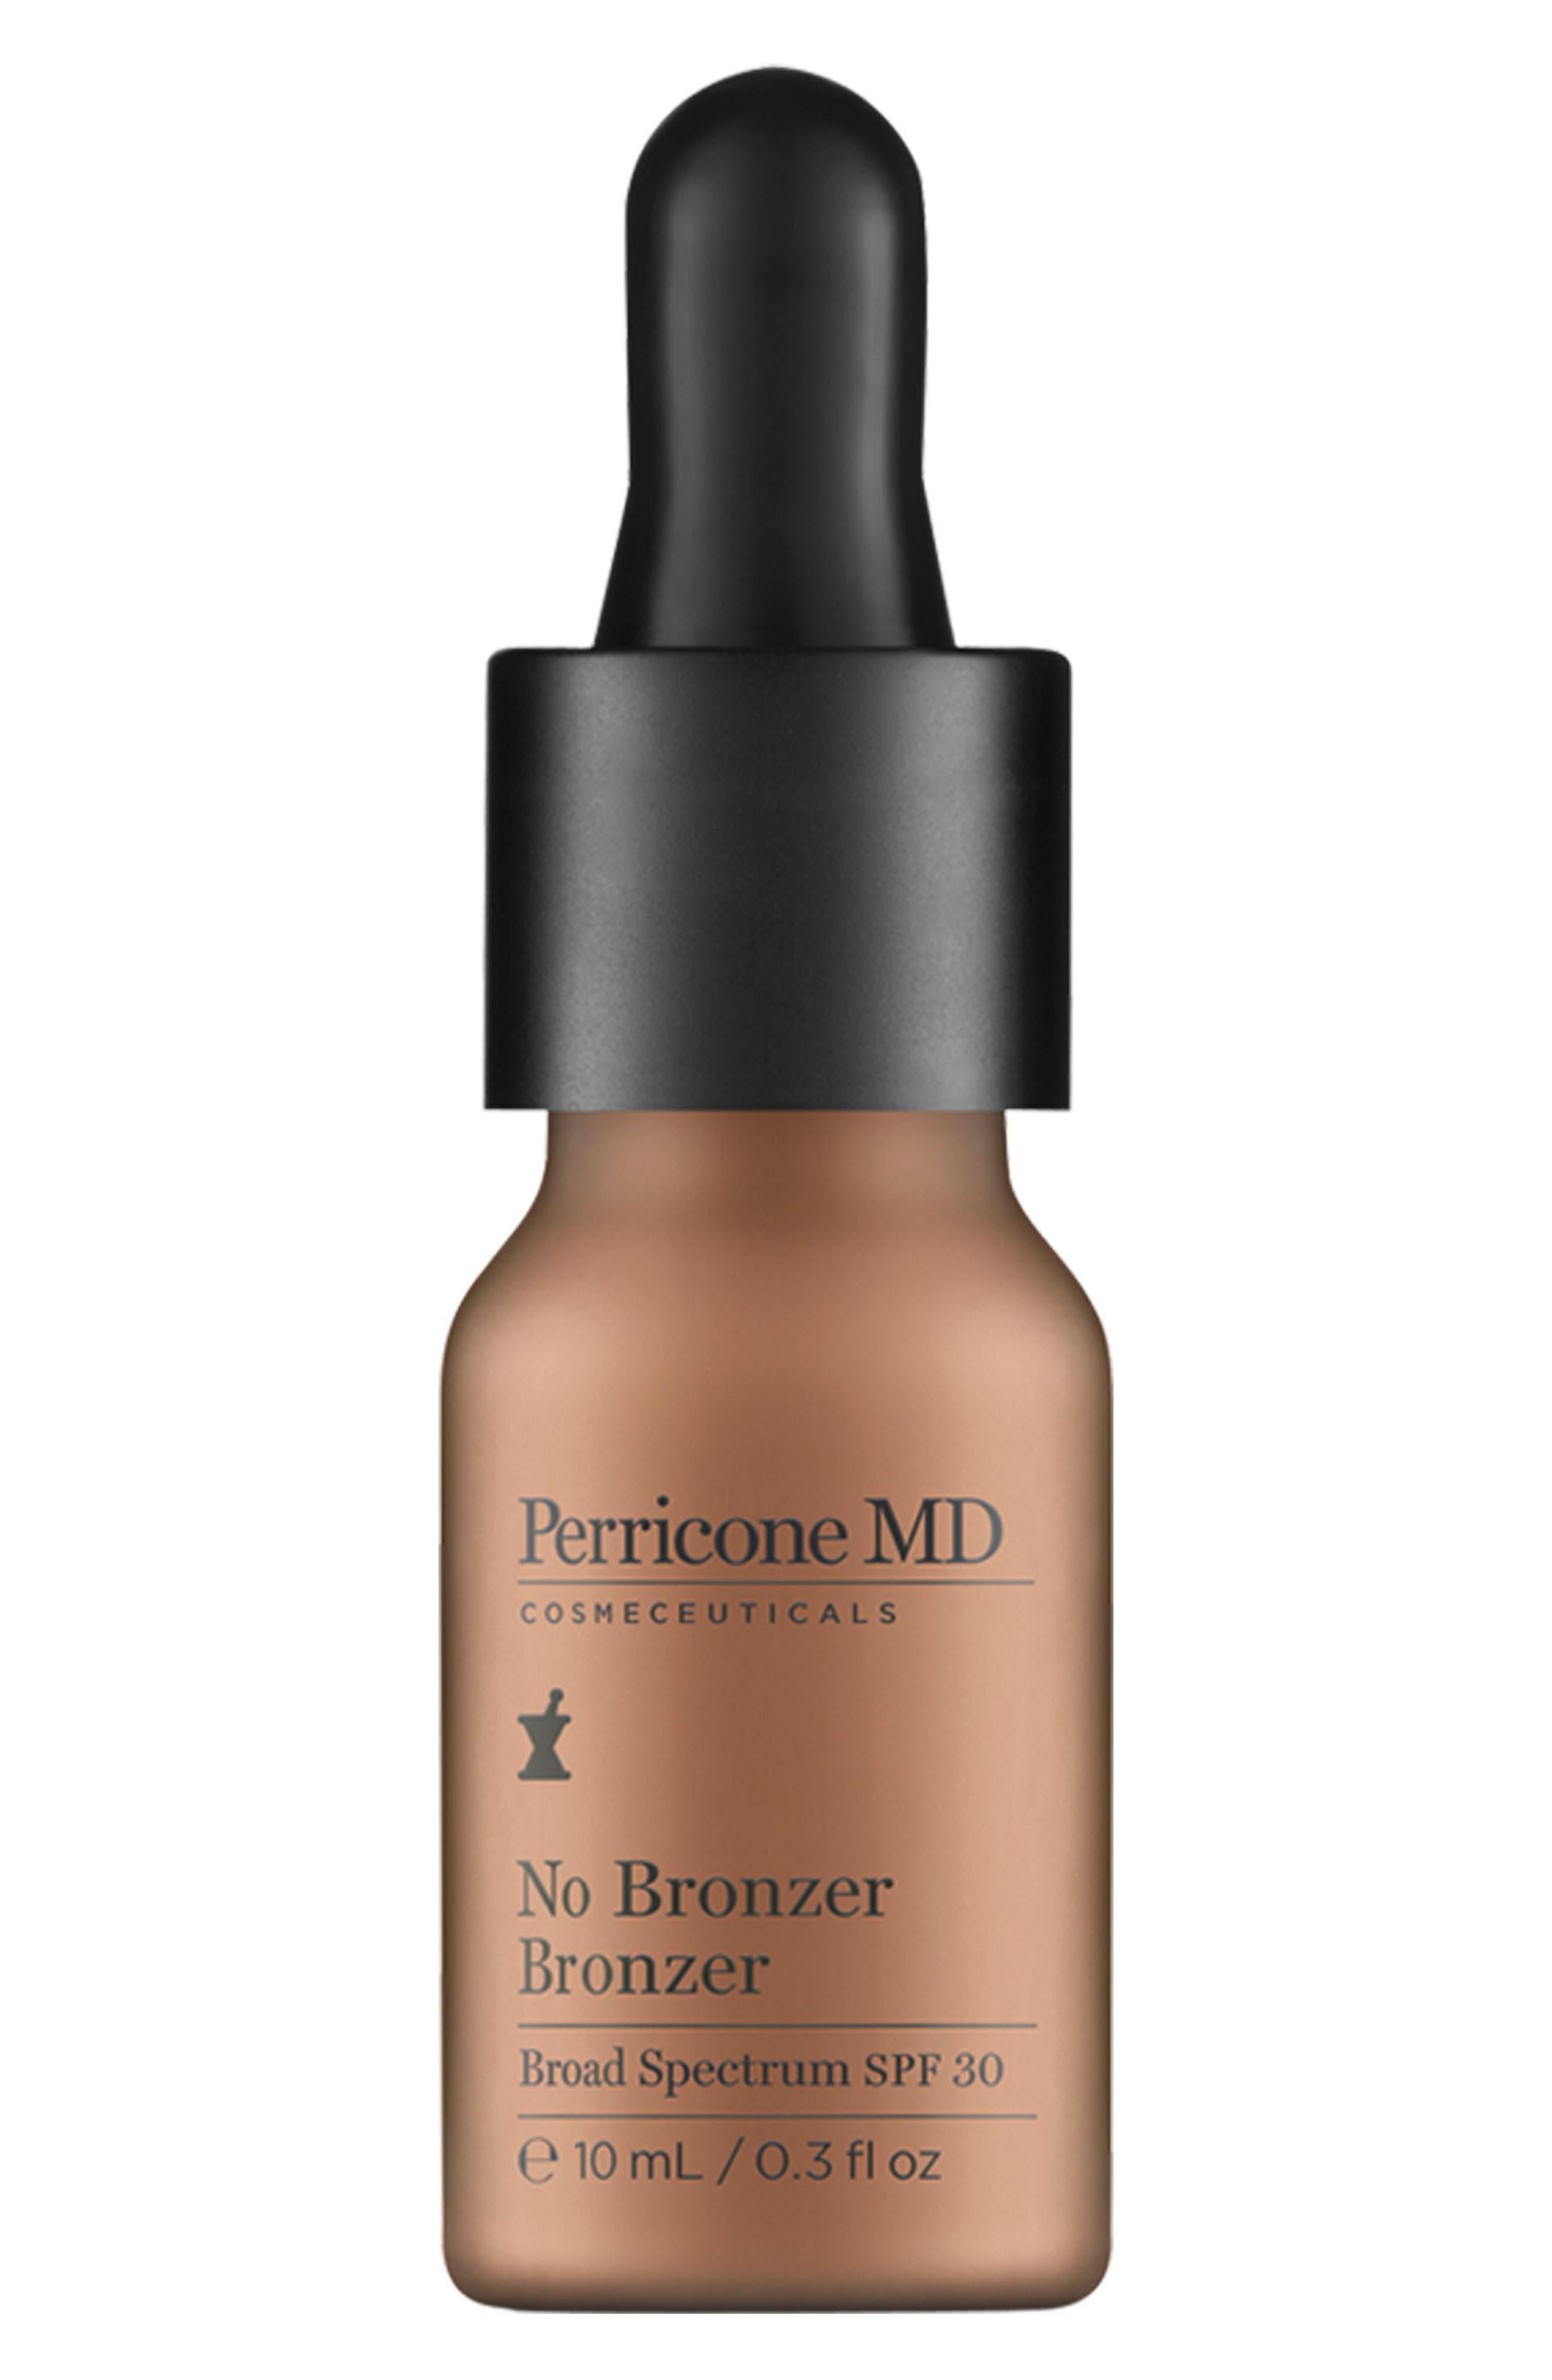 Main Image - Perricone MD No Bronzer Bronzer Broad Spectrum SPF 30